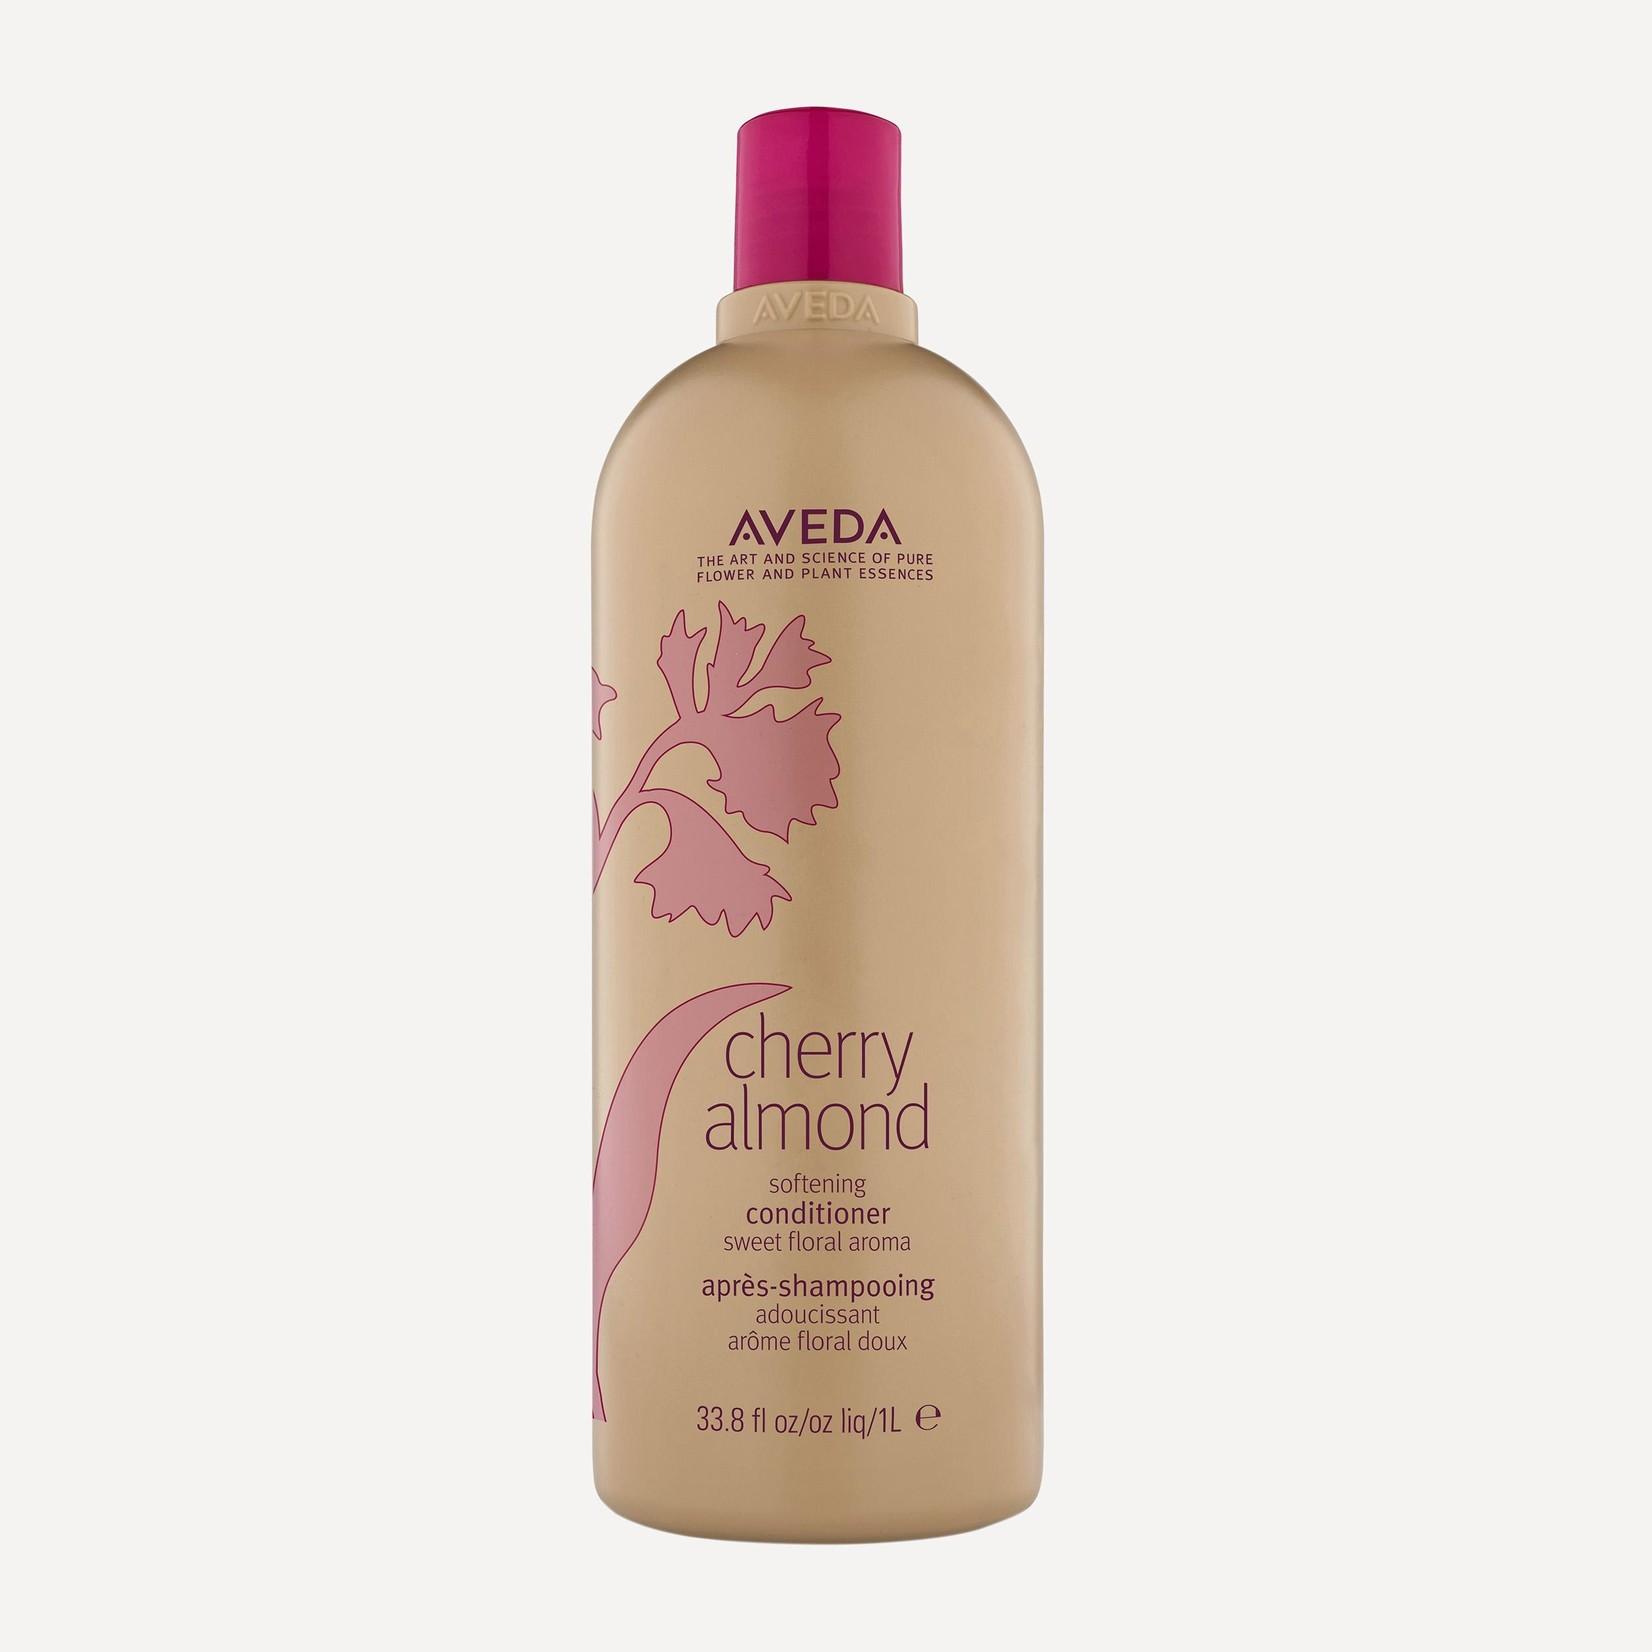 AVEDA Cherry Almond Softening Conditioner